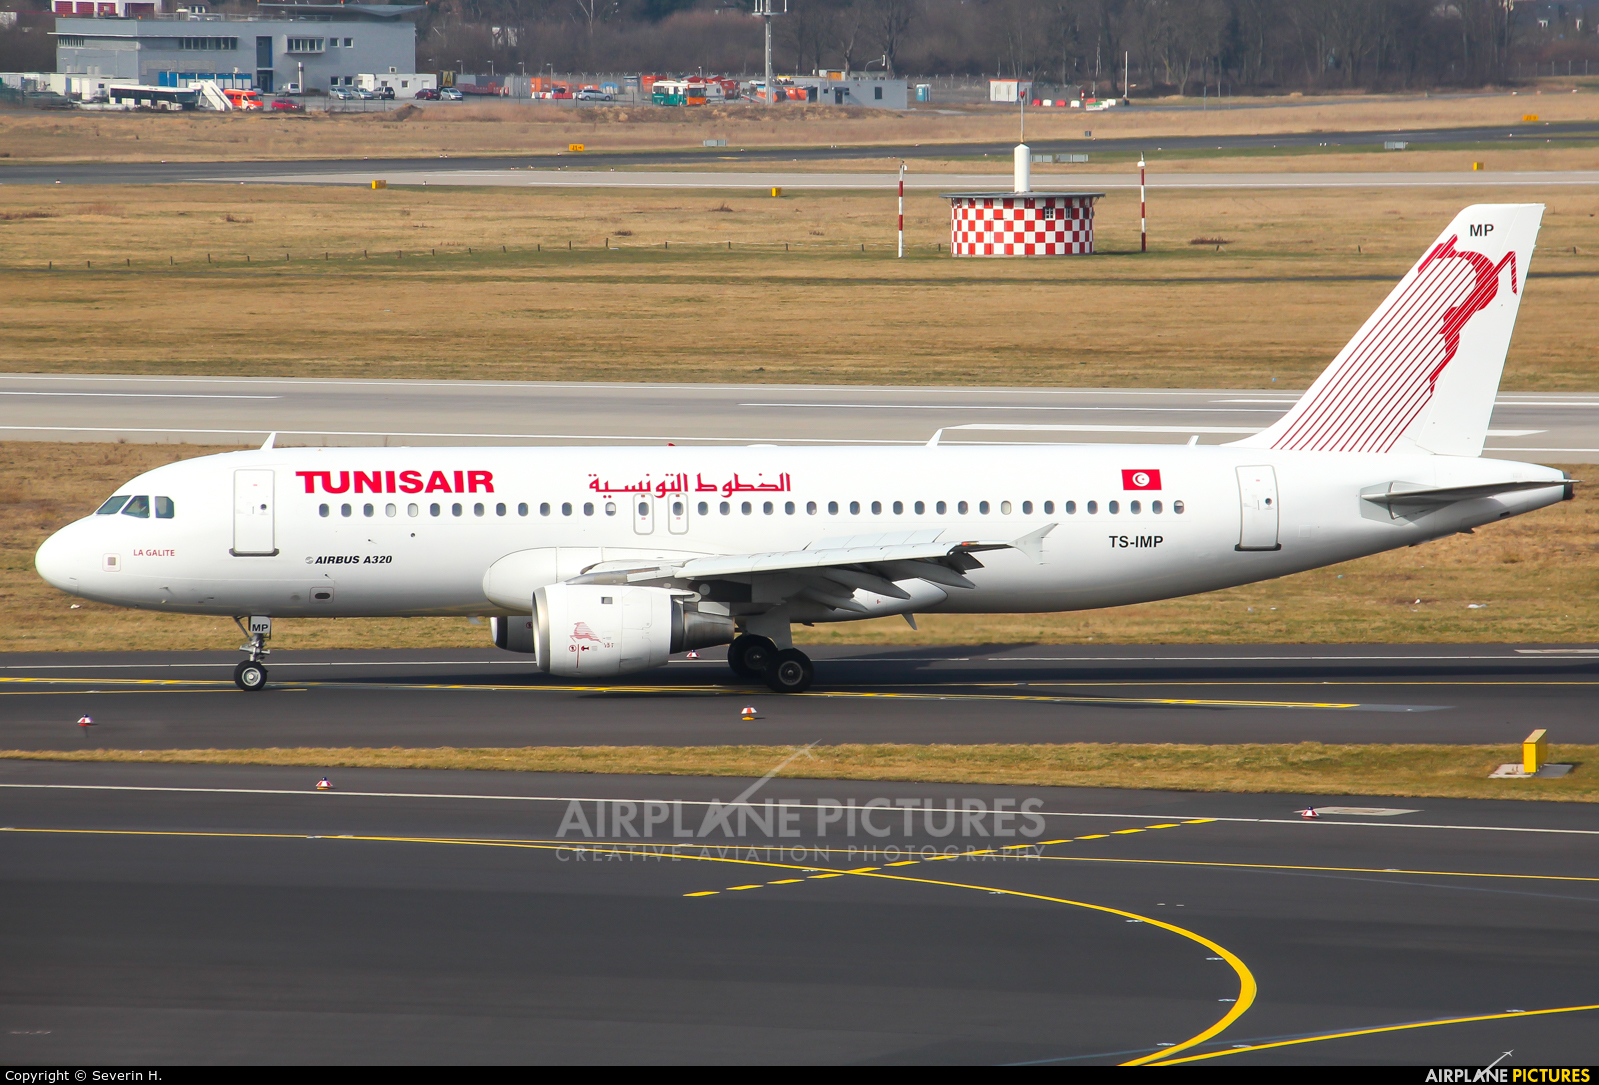 Tunisair TS-IMP aircraft at Düsseldorf